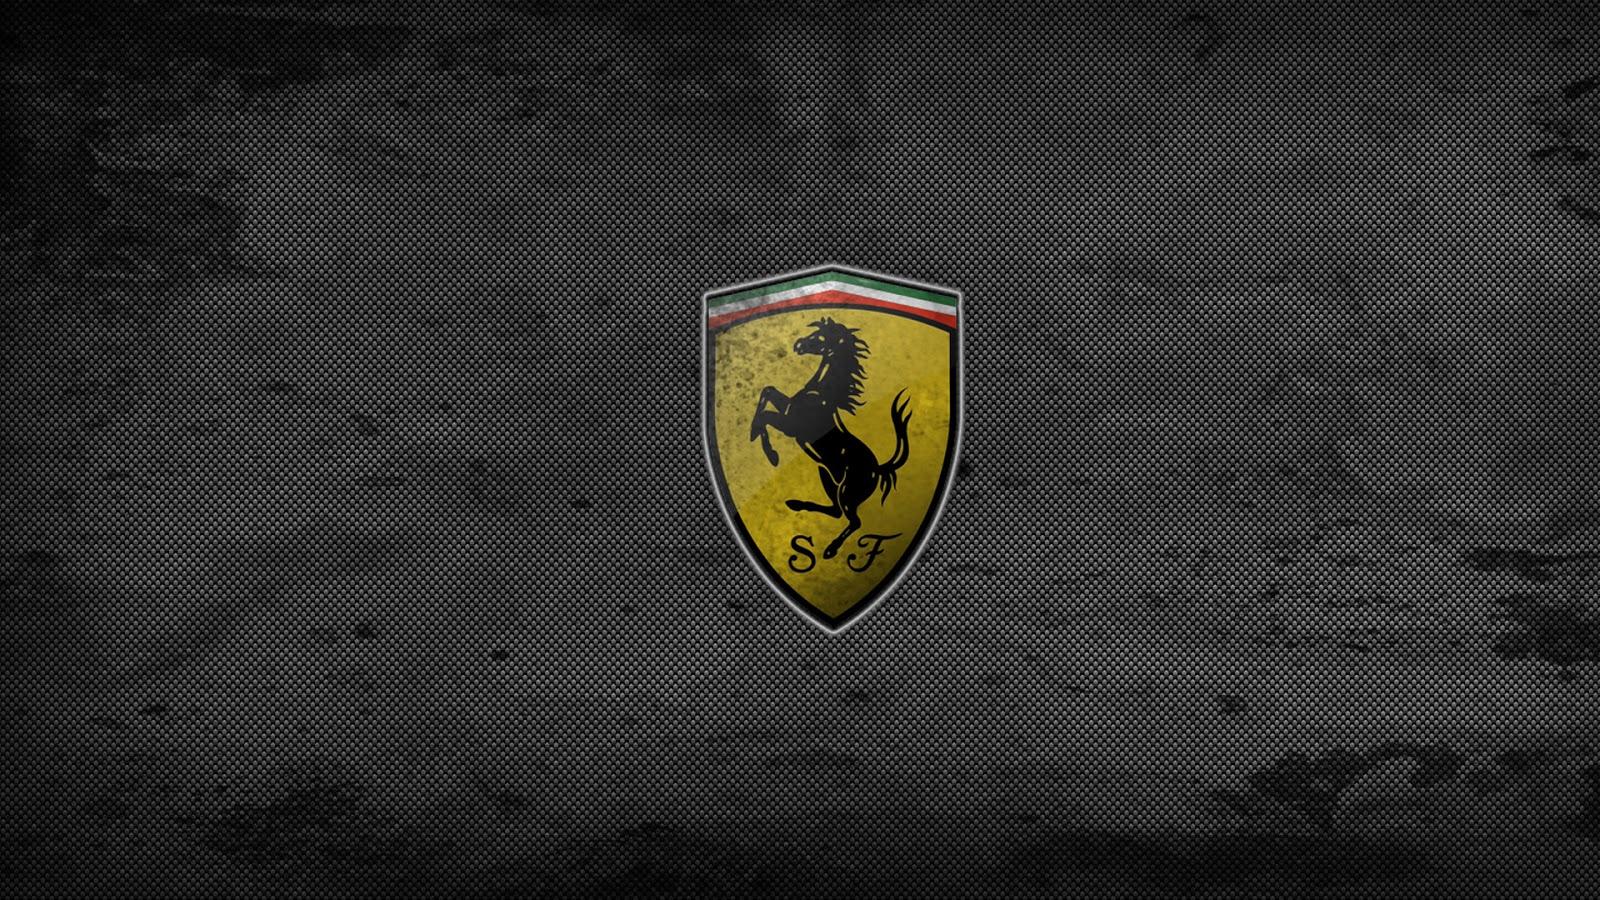 wallpapers ferrari logo - photo #8